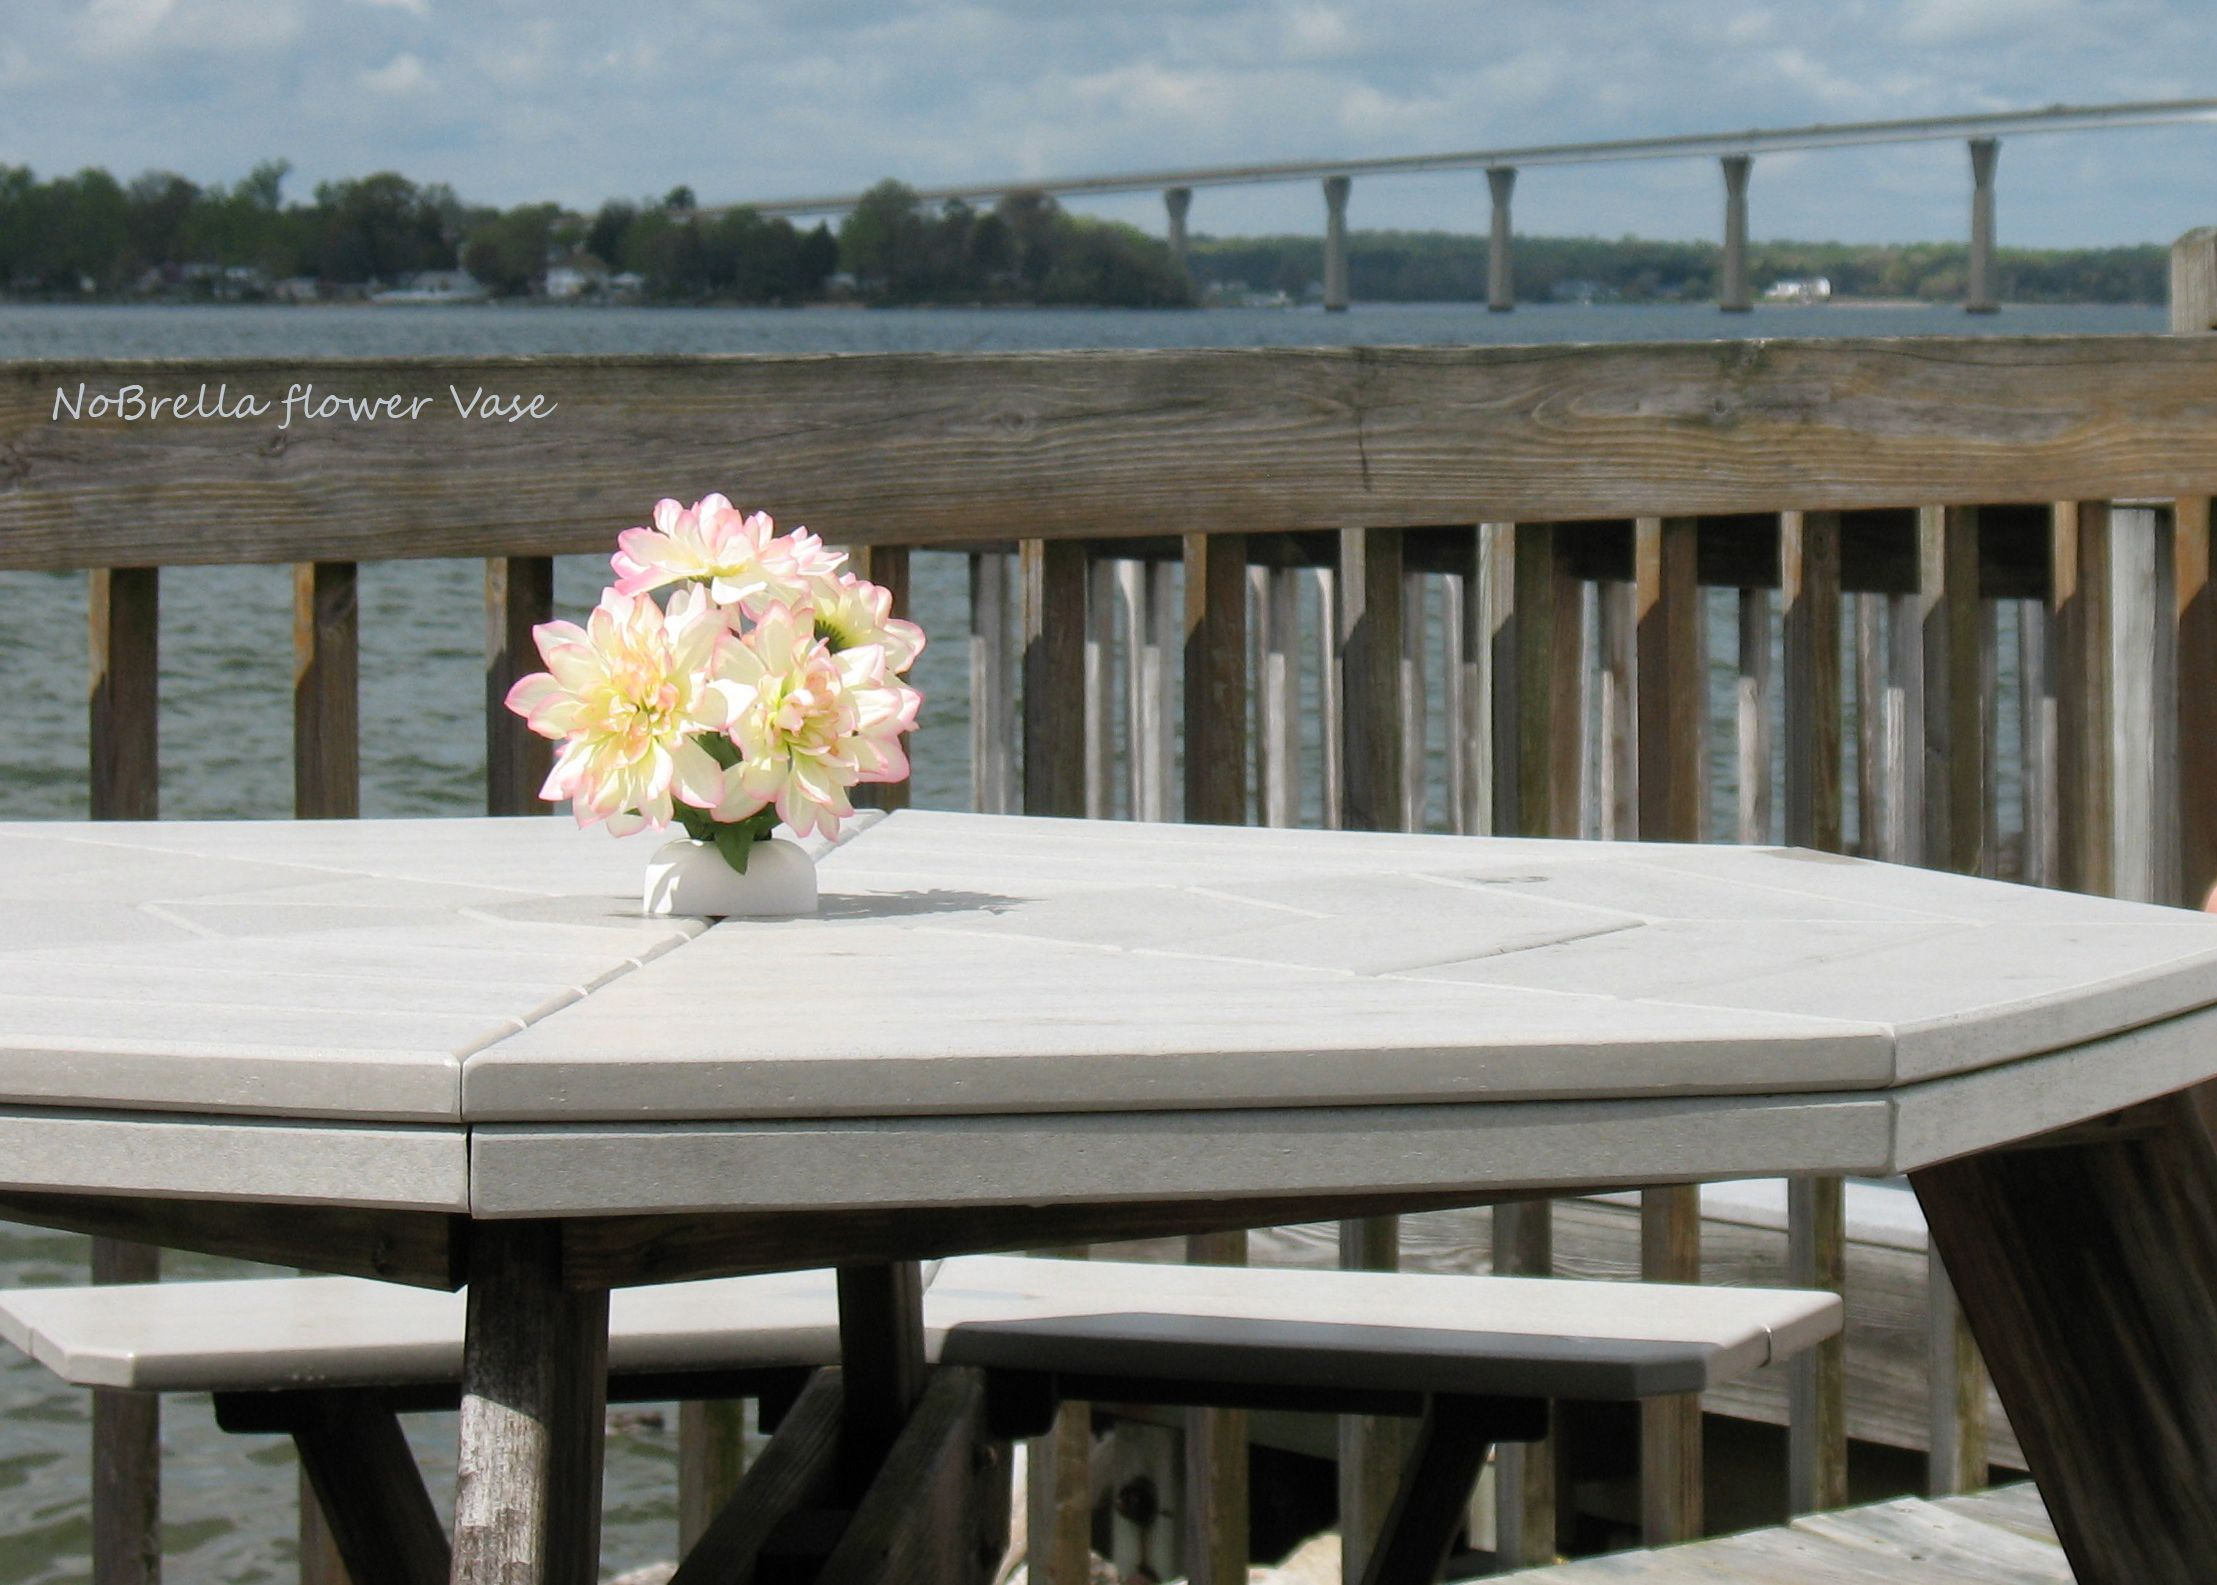 The Flower Creation Station™ Patio Table Umbrella Hole